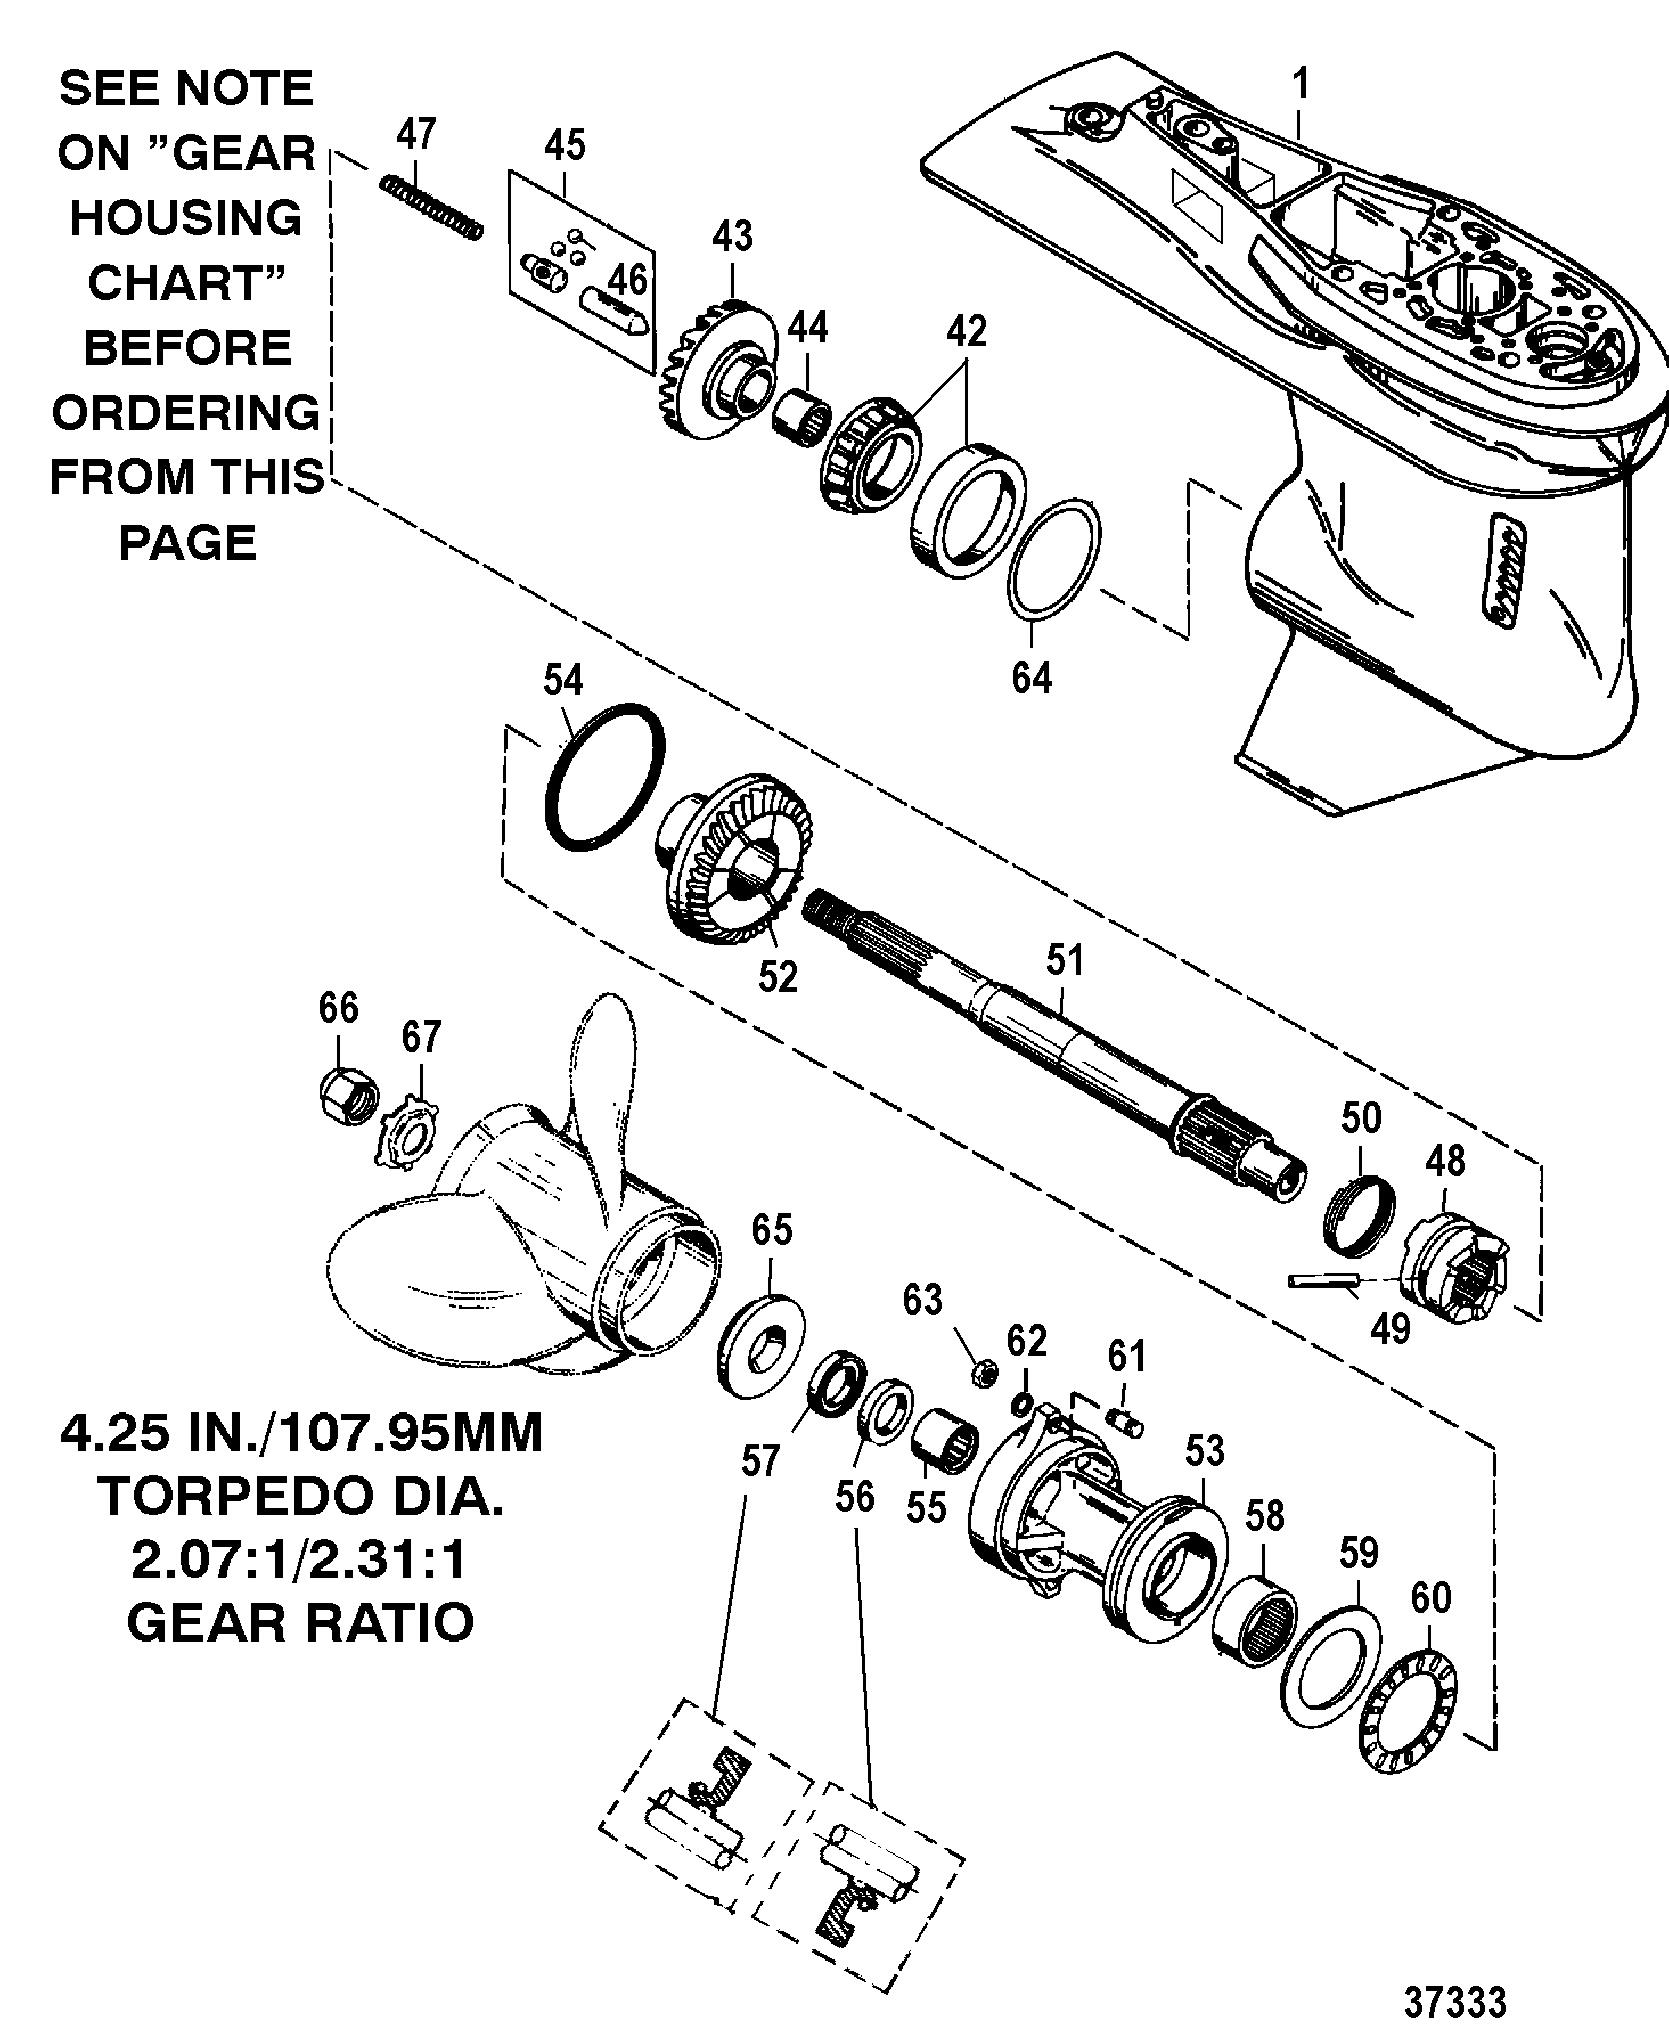 Gear Housing Prop Shaft 3 Jaw Reverse Clutch For Mariner